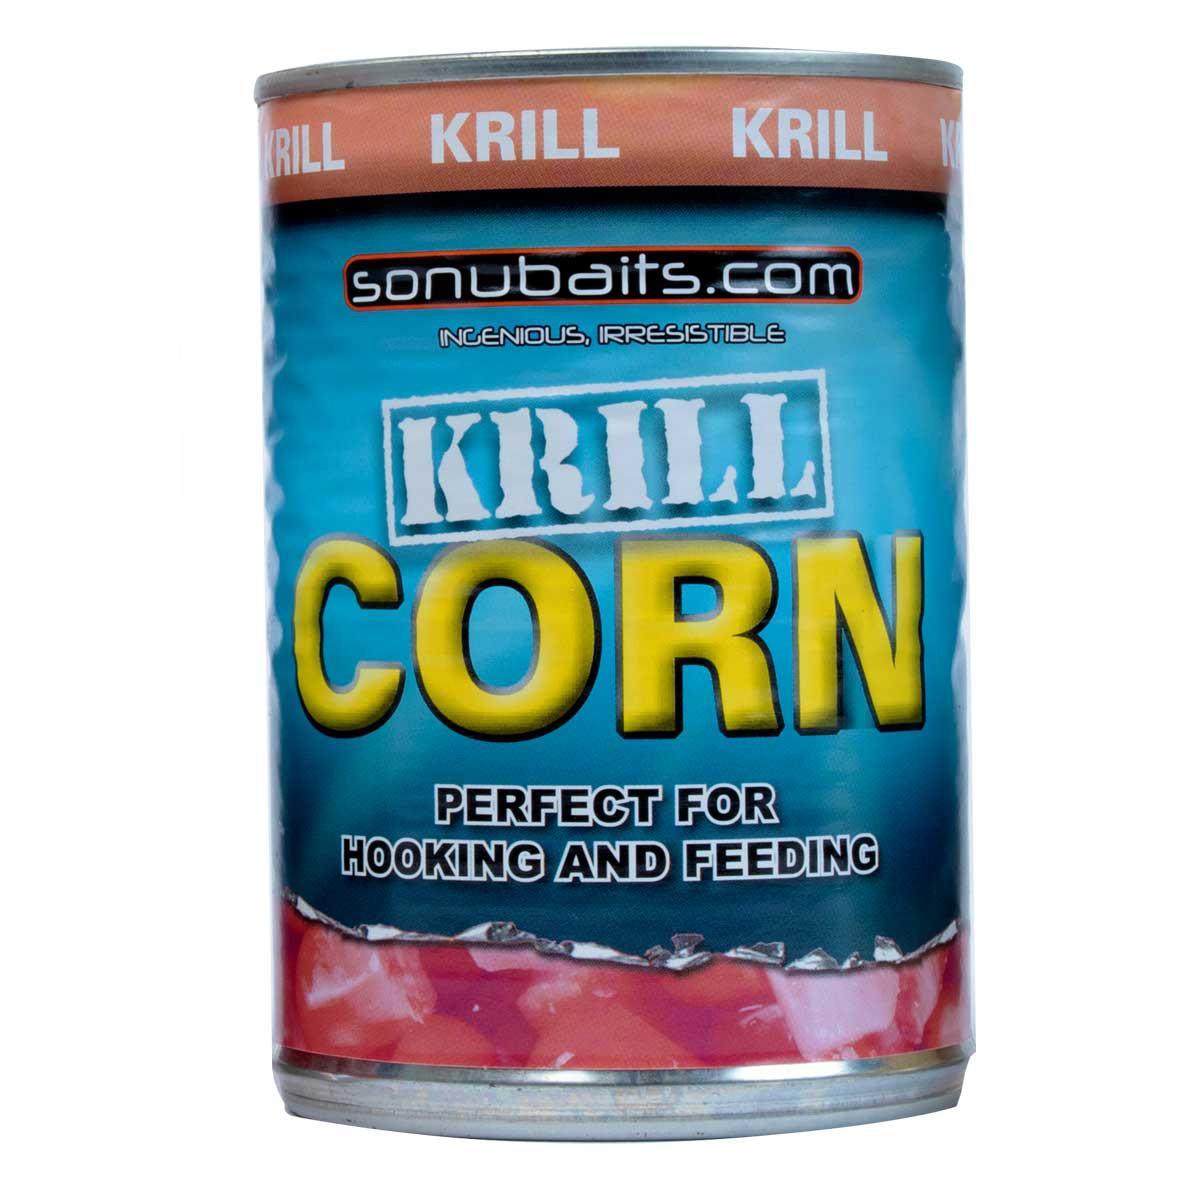 Sonubaits Krill Corn